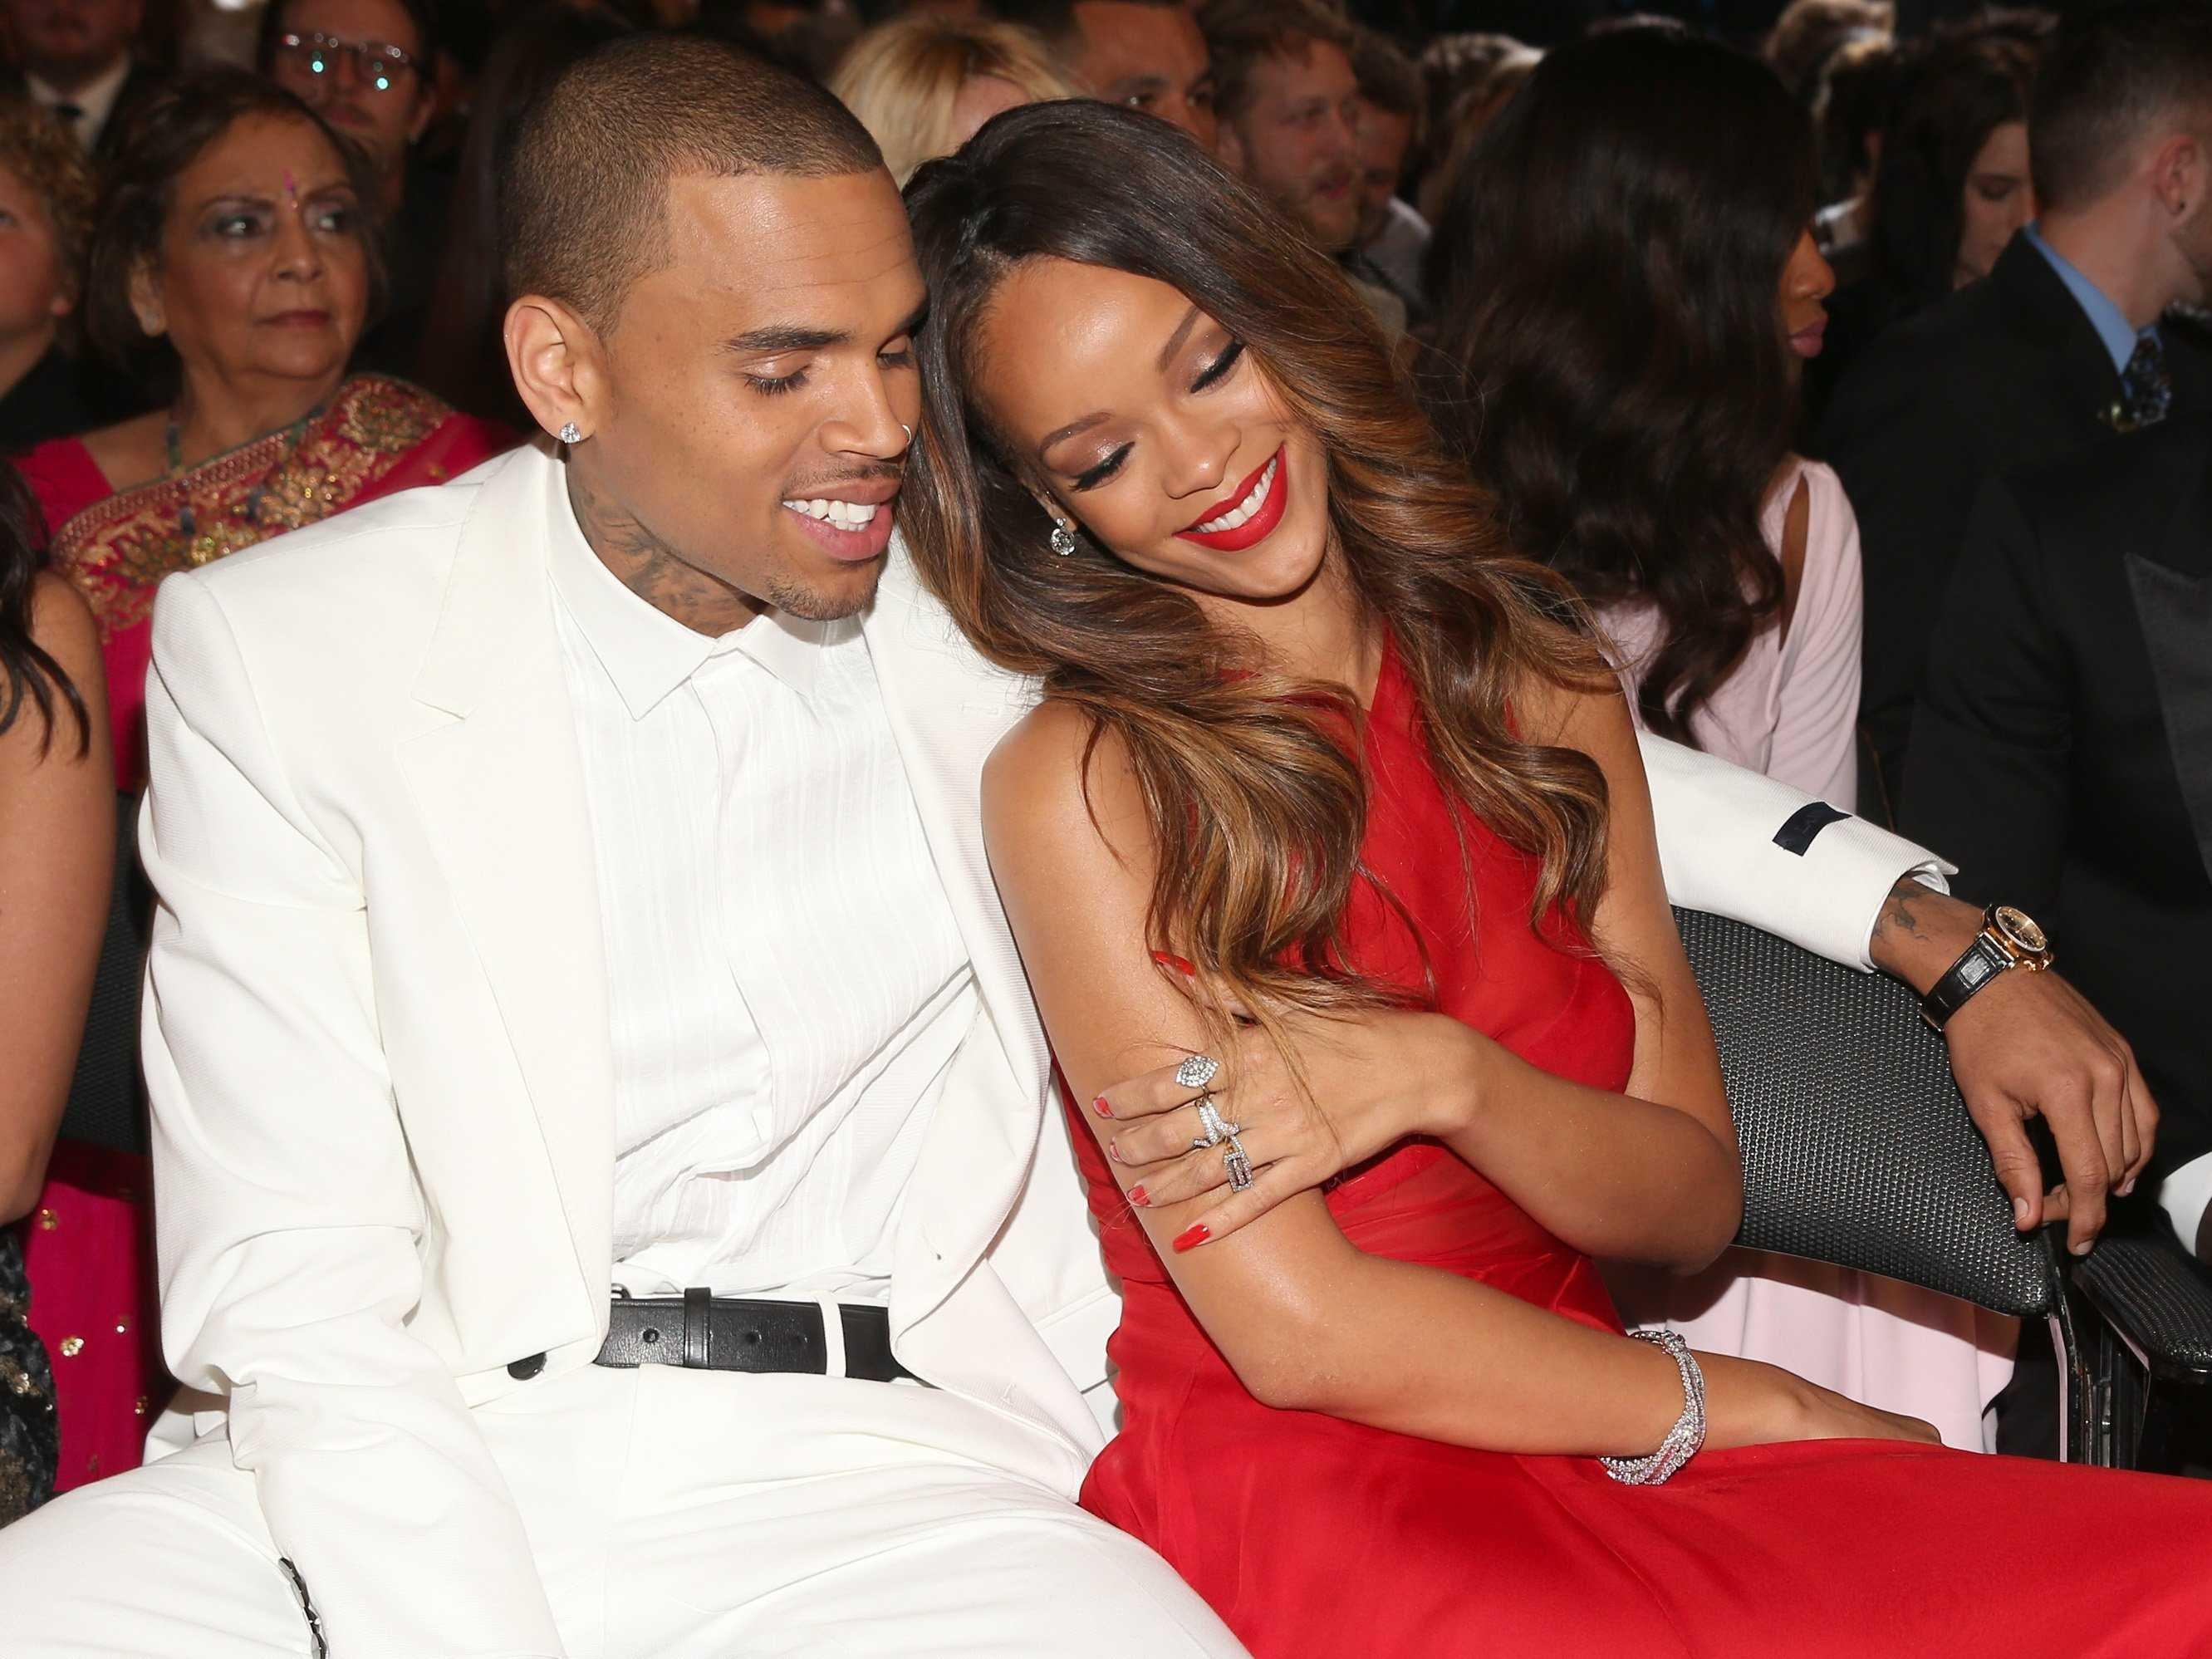 1. Chris Brown